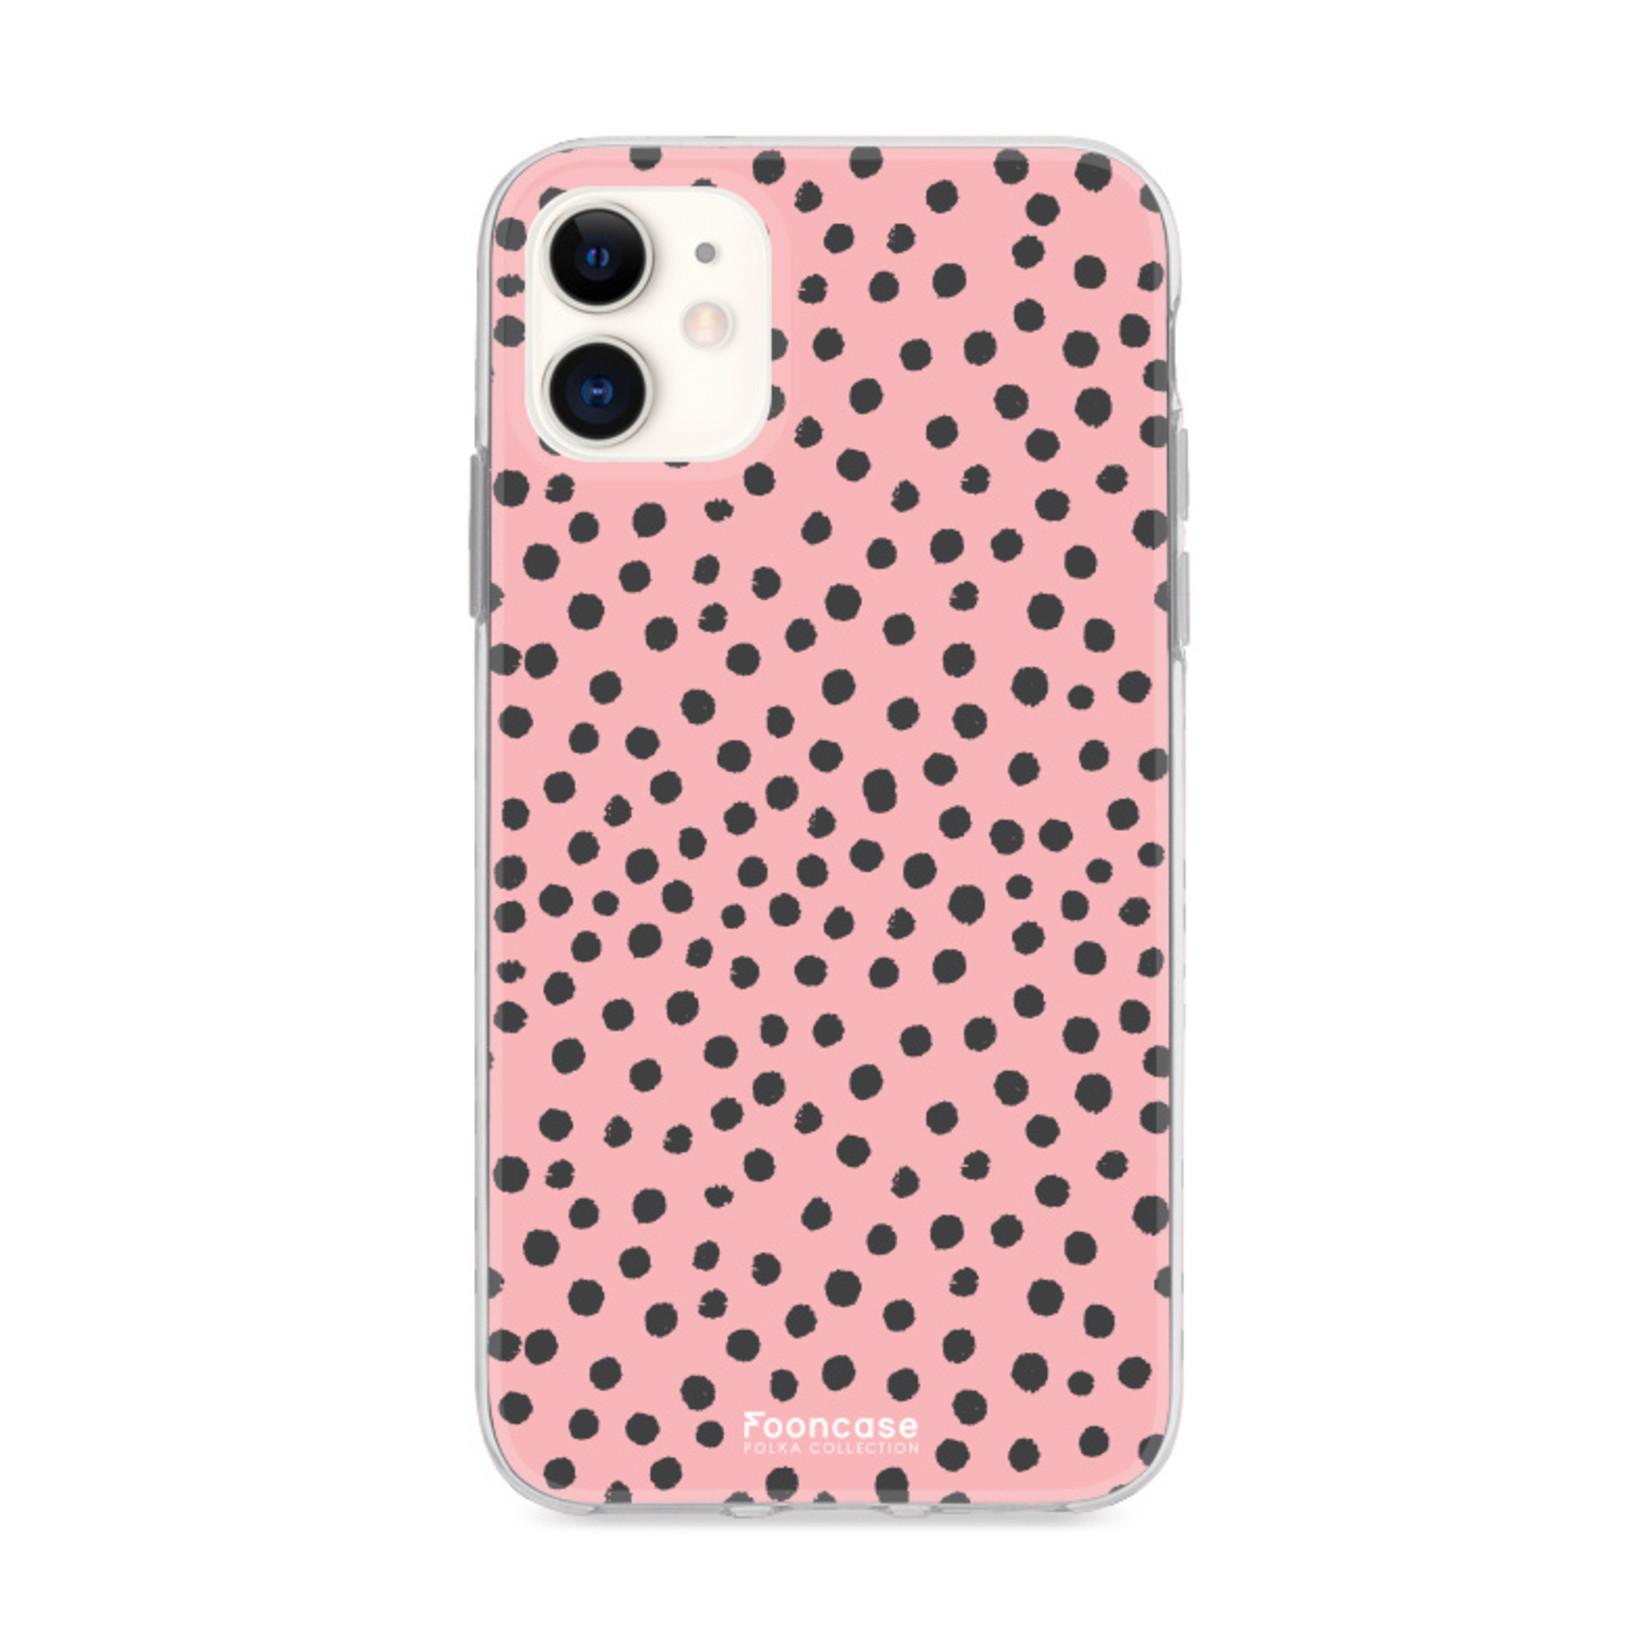 FOONCASE iPhone 12 Mini hoesje TPU Soft Case - Back Cover - POLKA COLLECTION / Stipjes / Stippen / Roze